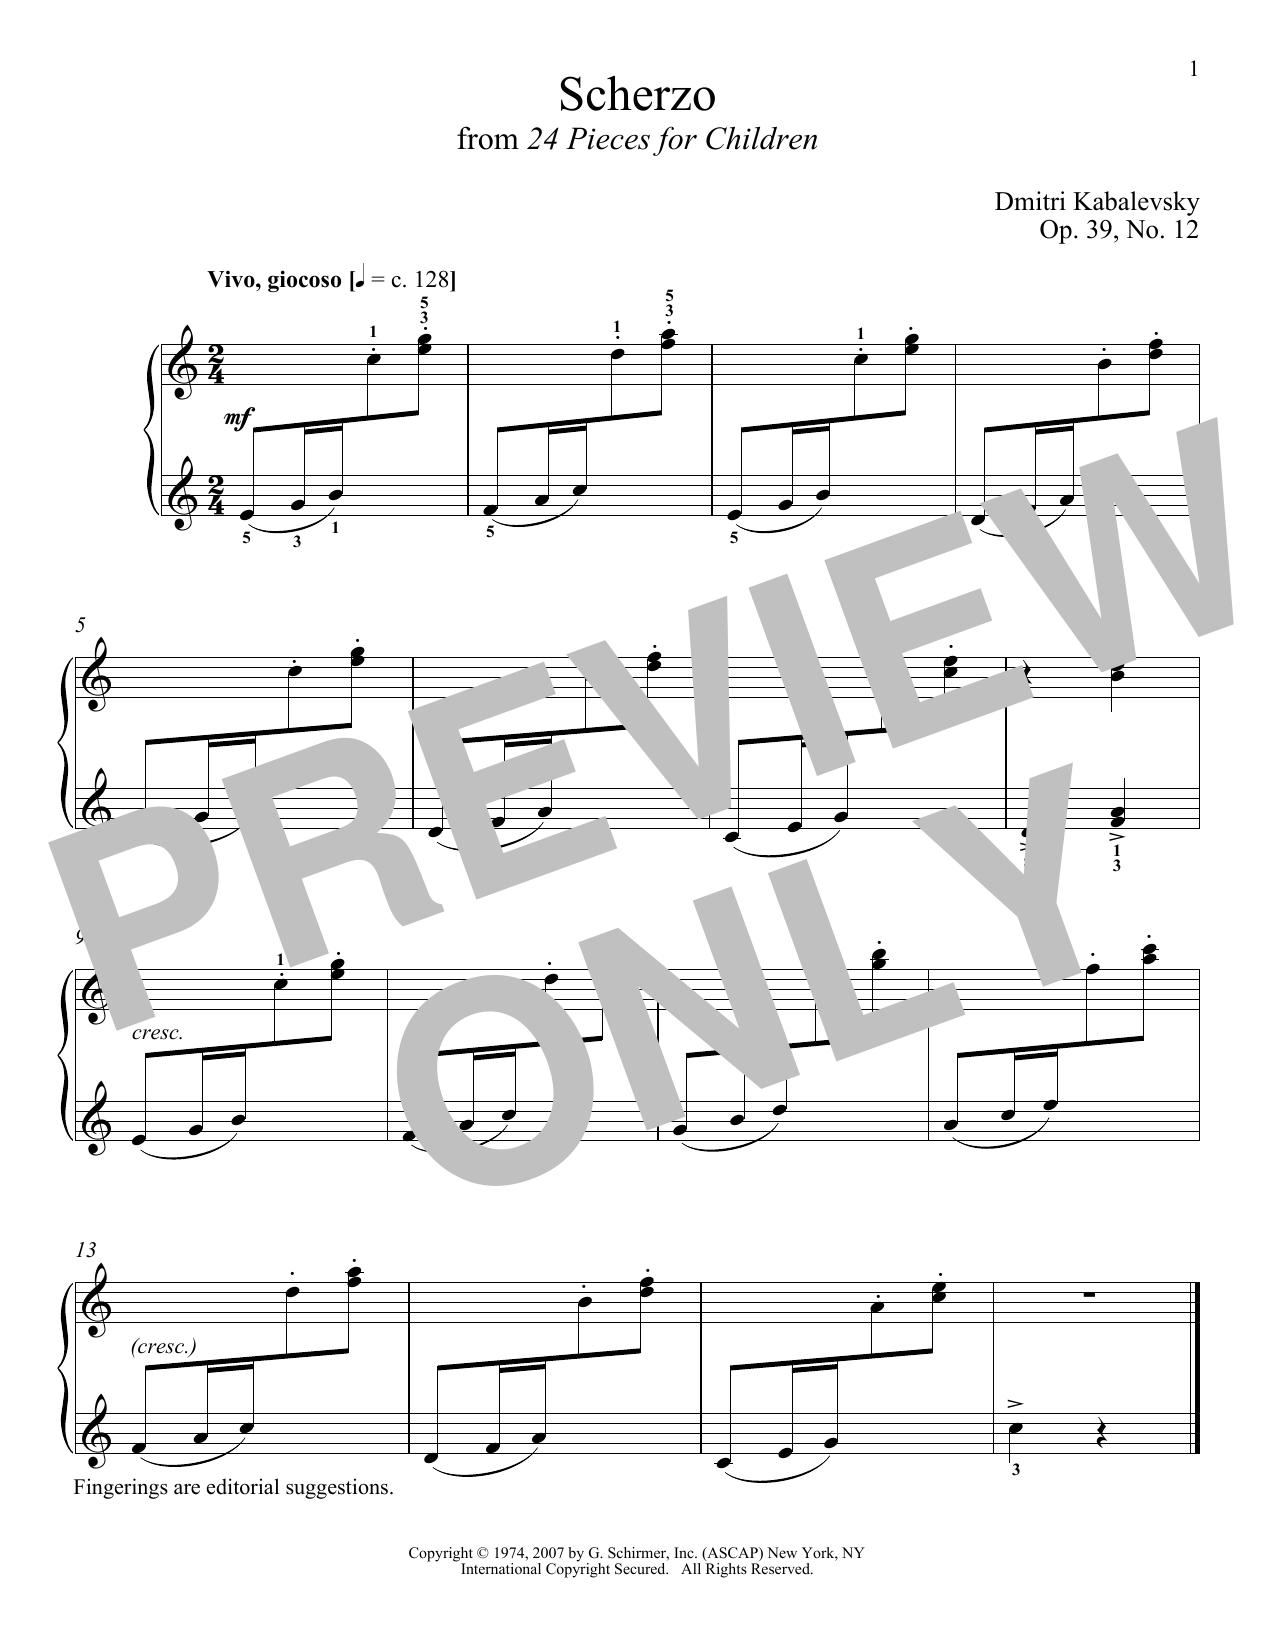 Dmitri Kabalevsky Scherzo, Op. 39, No. 12 sheet music notes and chords. Download Printable PDF.